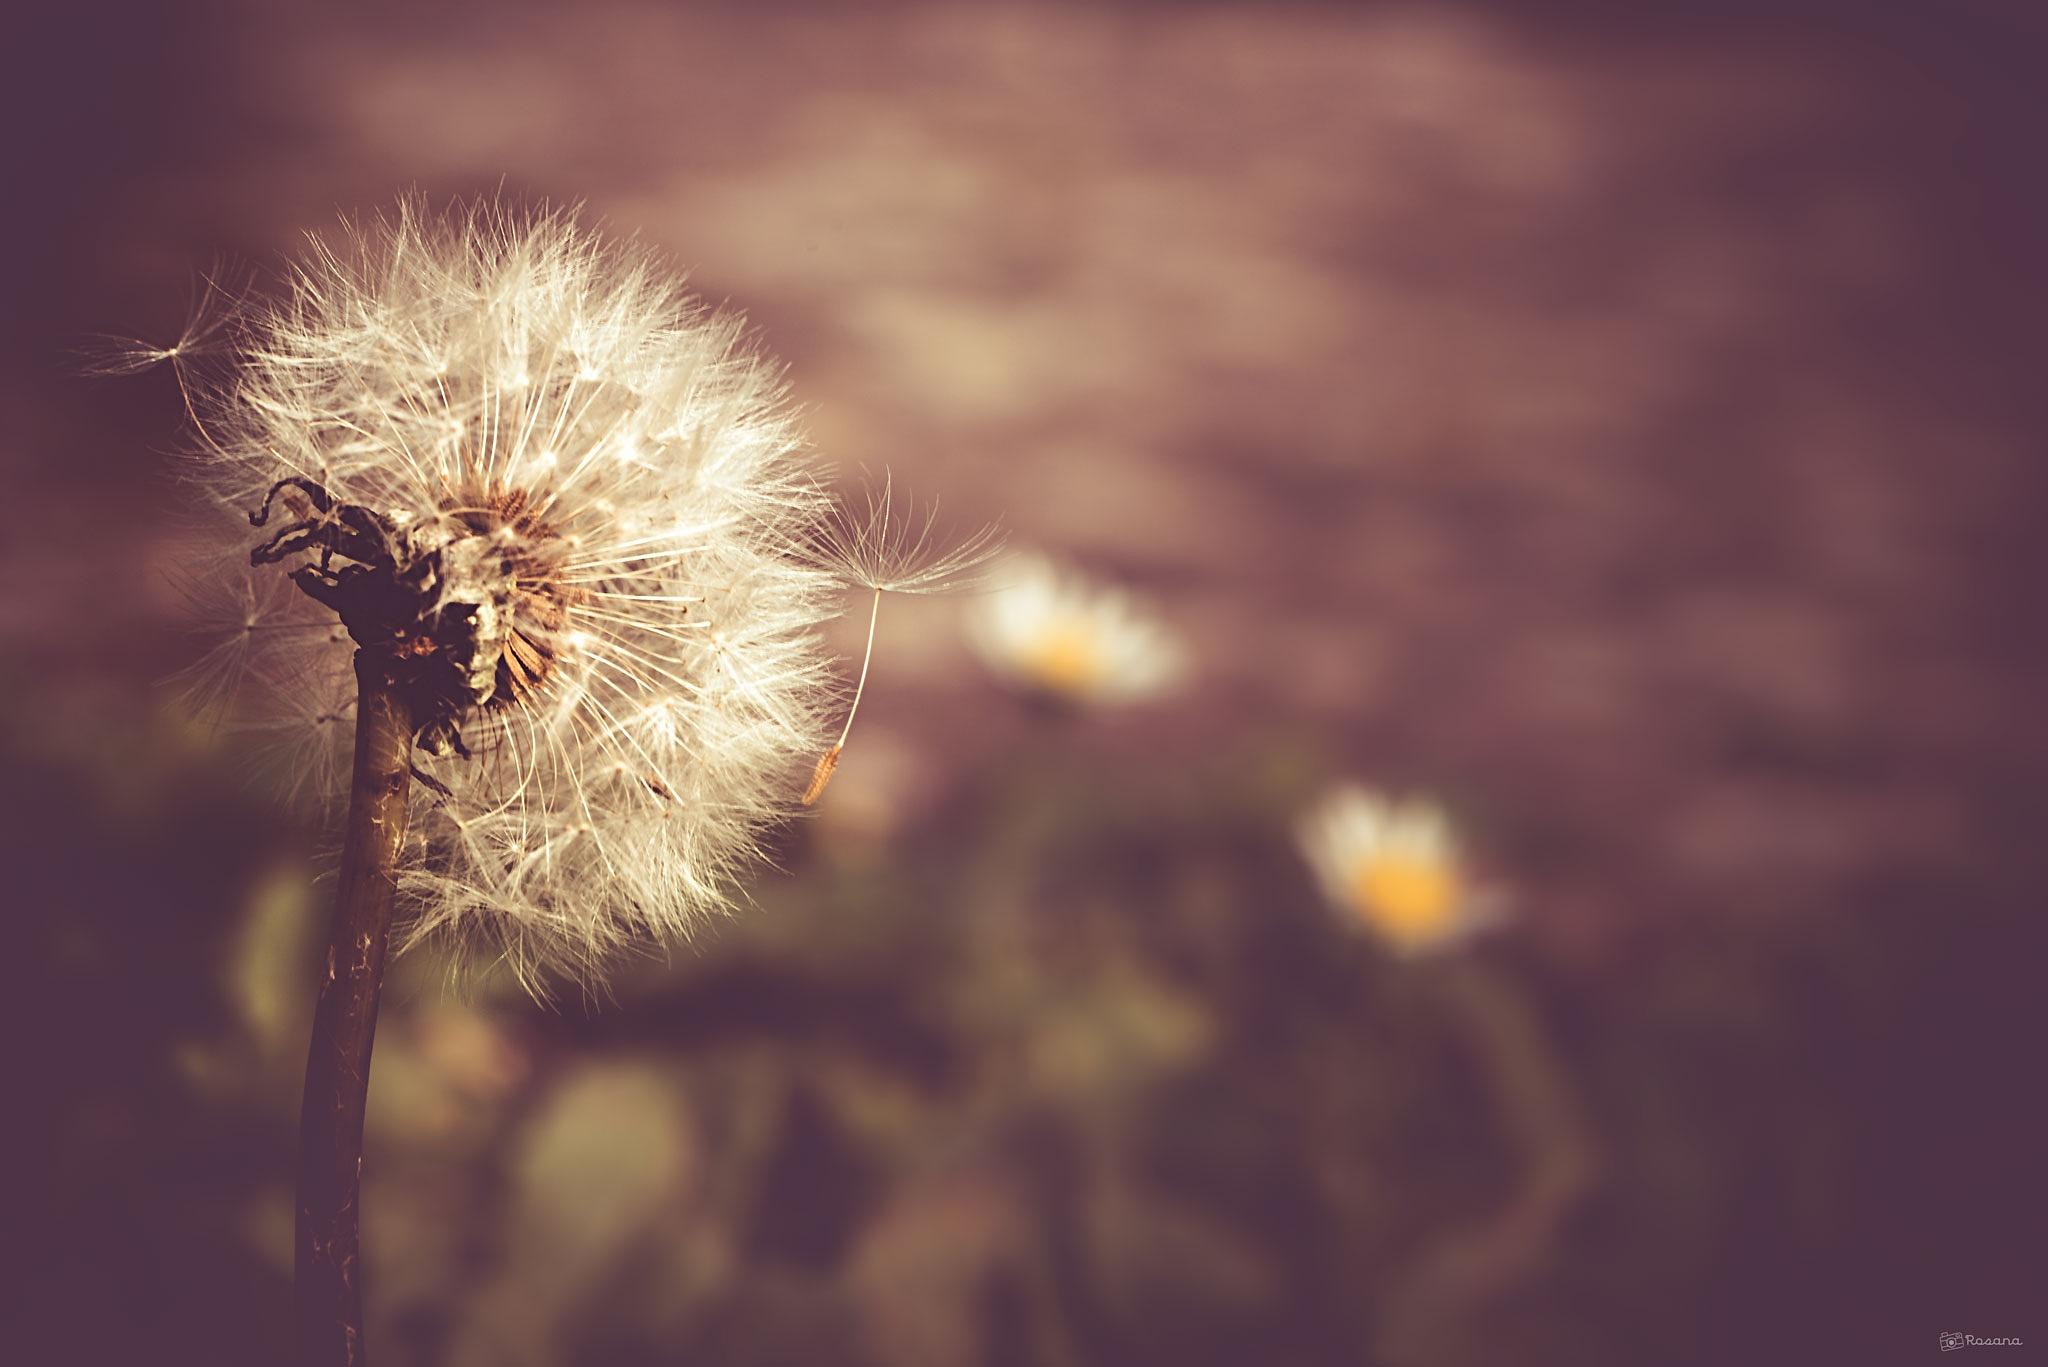 Dandelion by Rosana